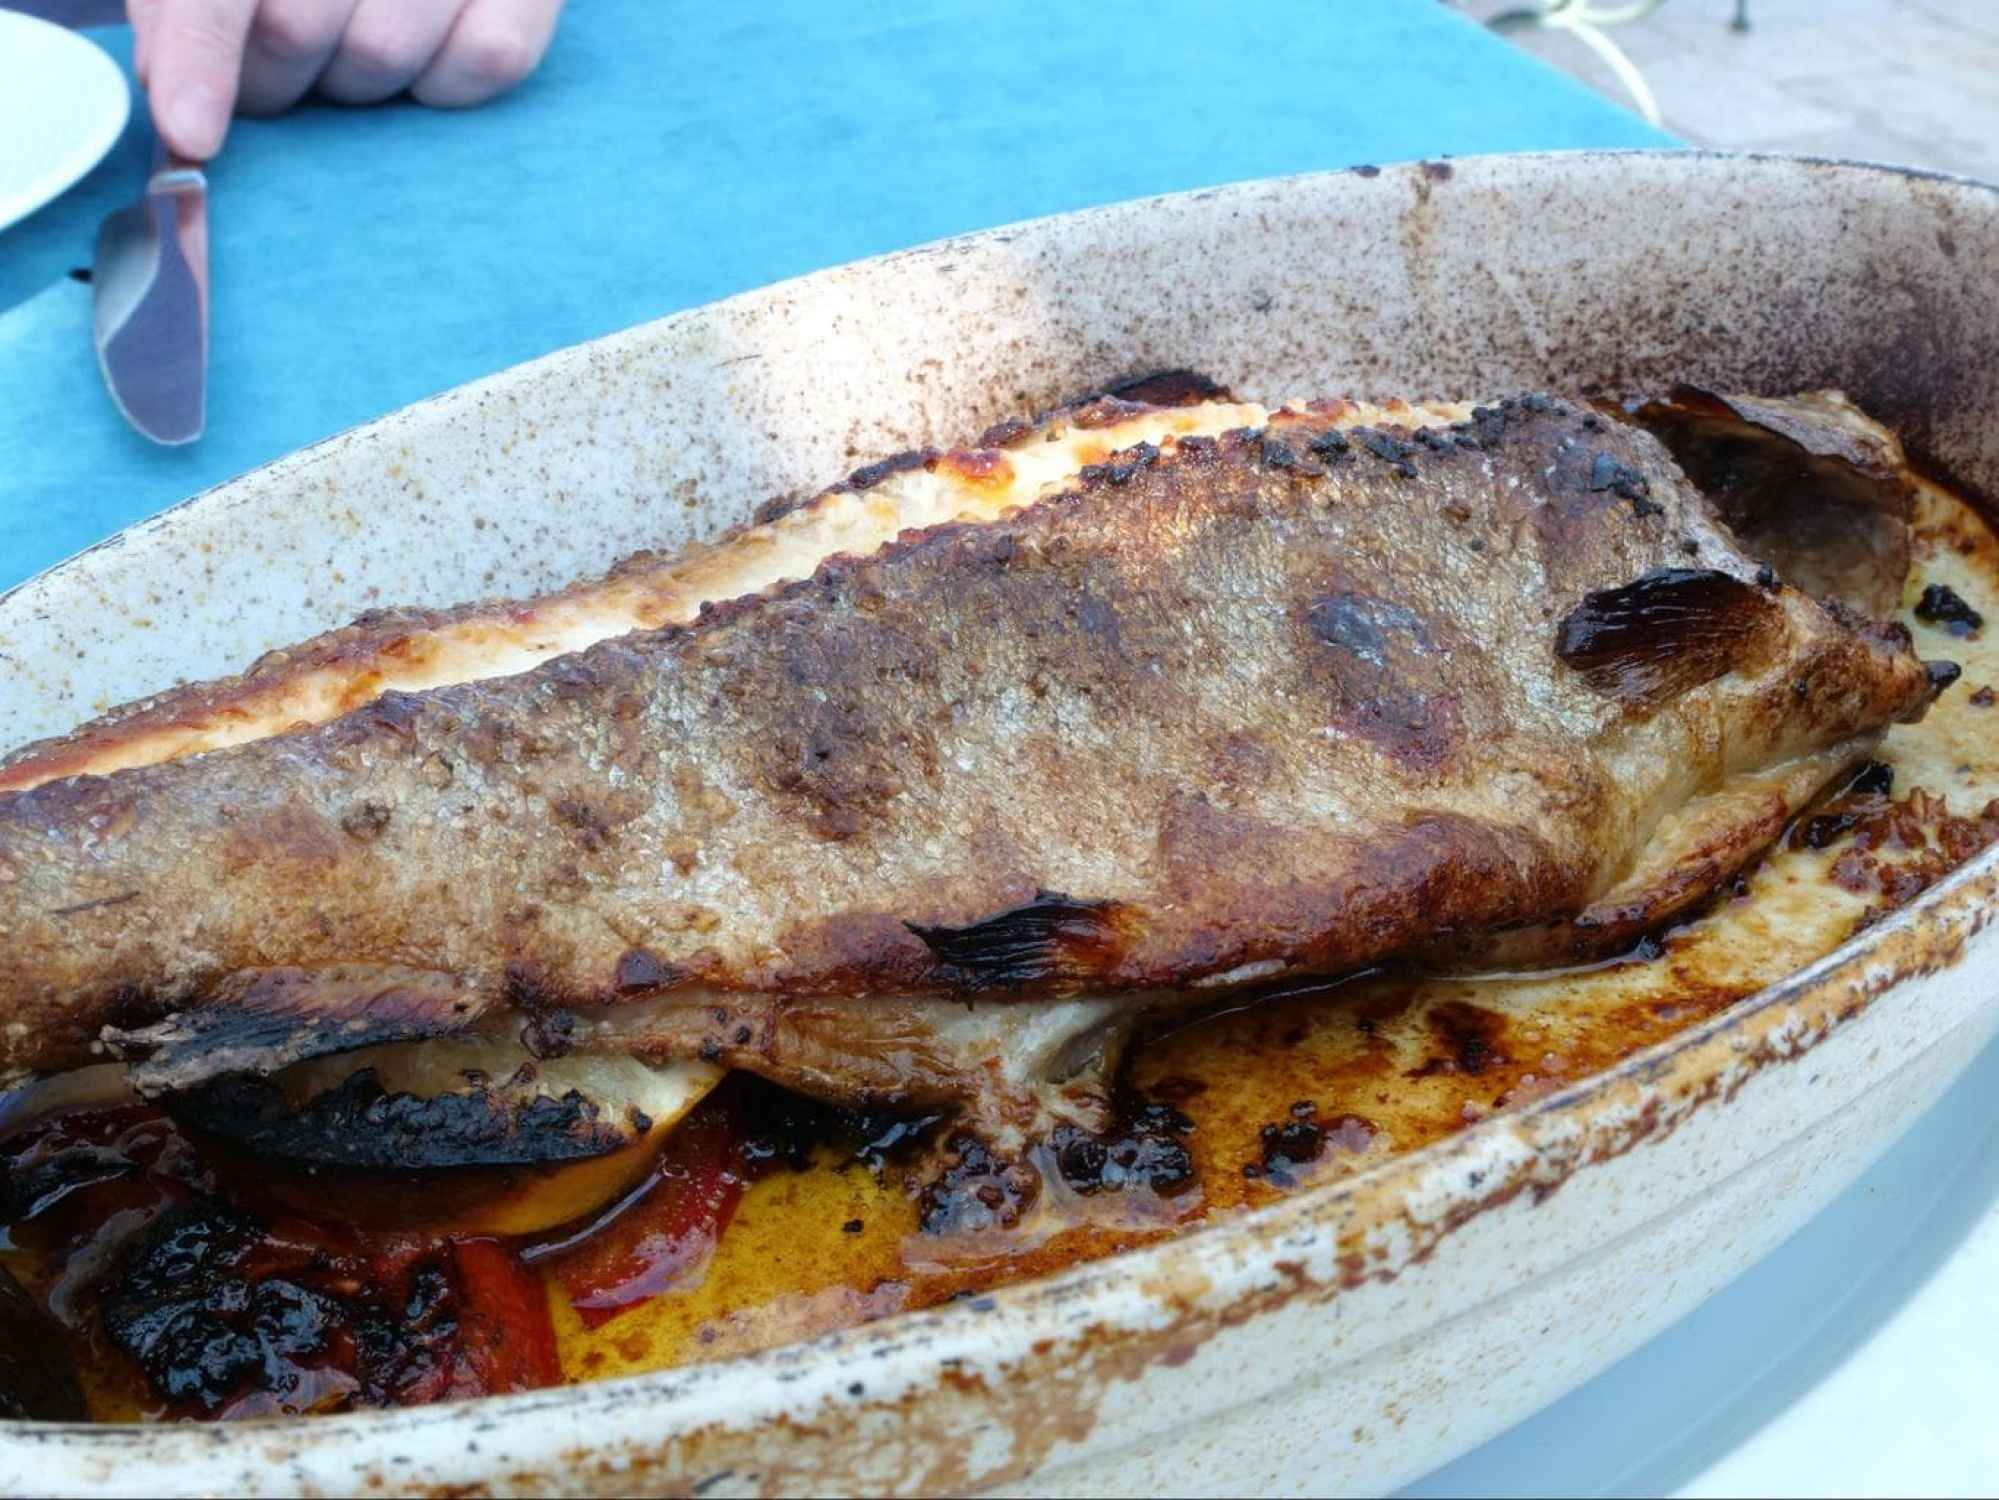 Baked whole sea bream fish